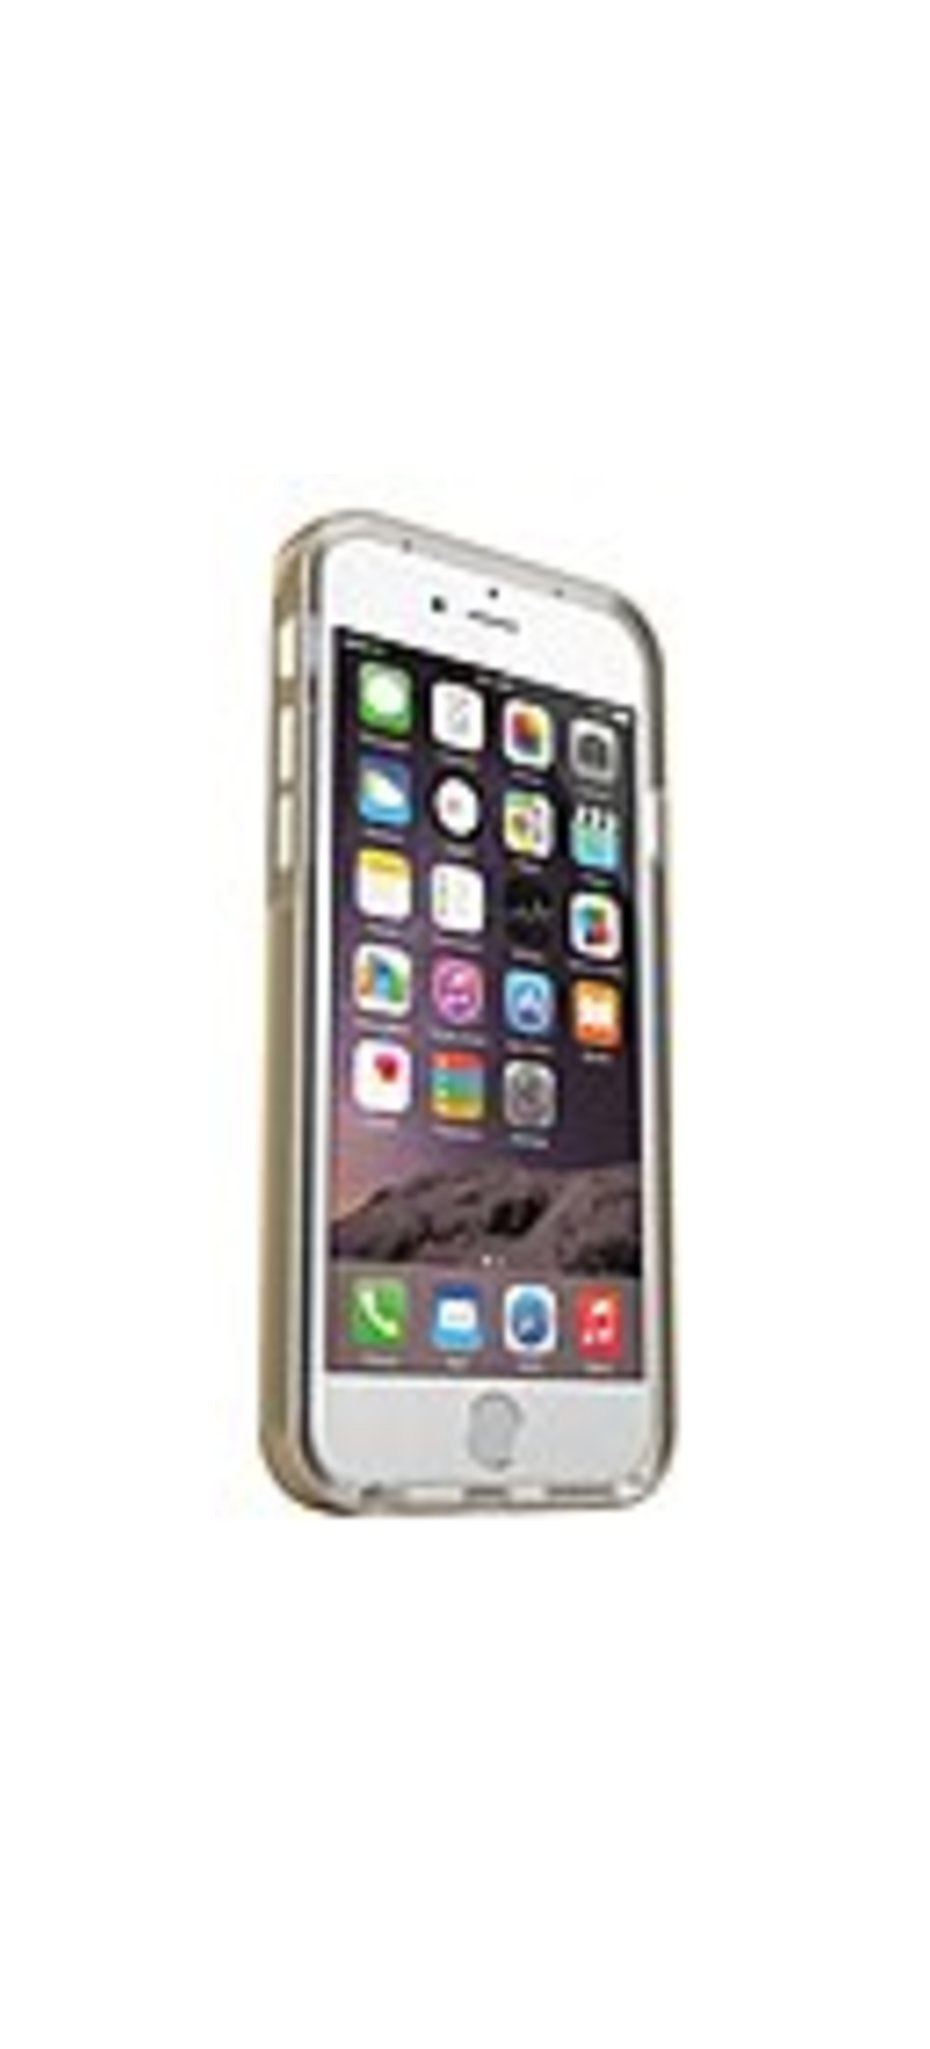 MOTA iPhone 6 Plus LED Flashing Case - Gold - iPhone - Gold, Transparent - Sleek Texture